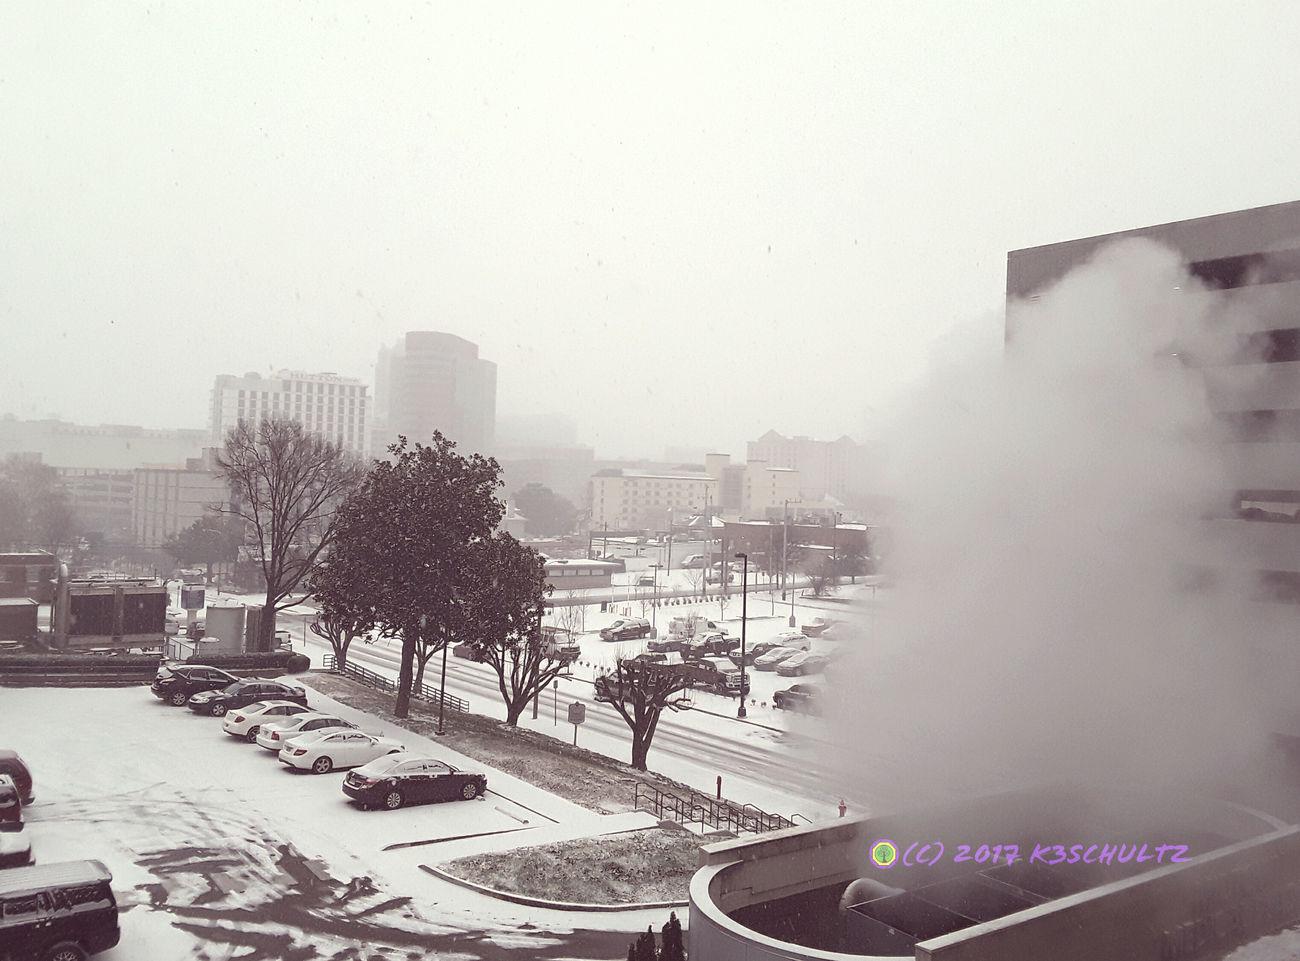 Day 6: Snowpocalypse 365DaysOfAwesomeness PhotographyProject Nashville Day 6 Weather Snow ❄